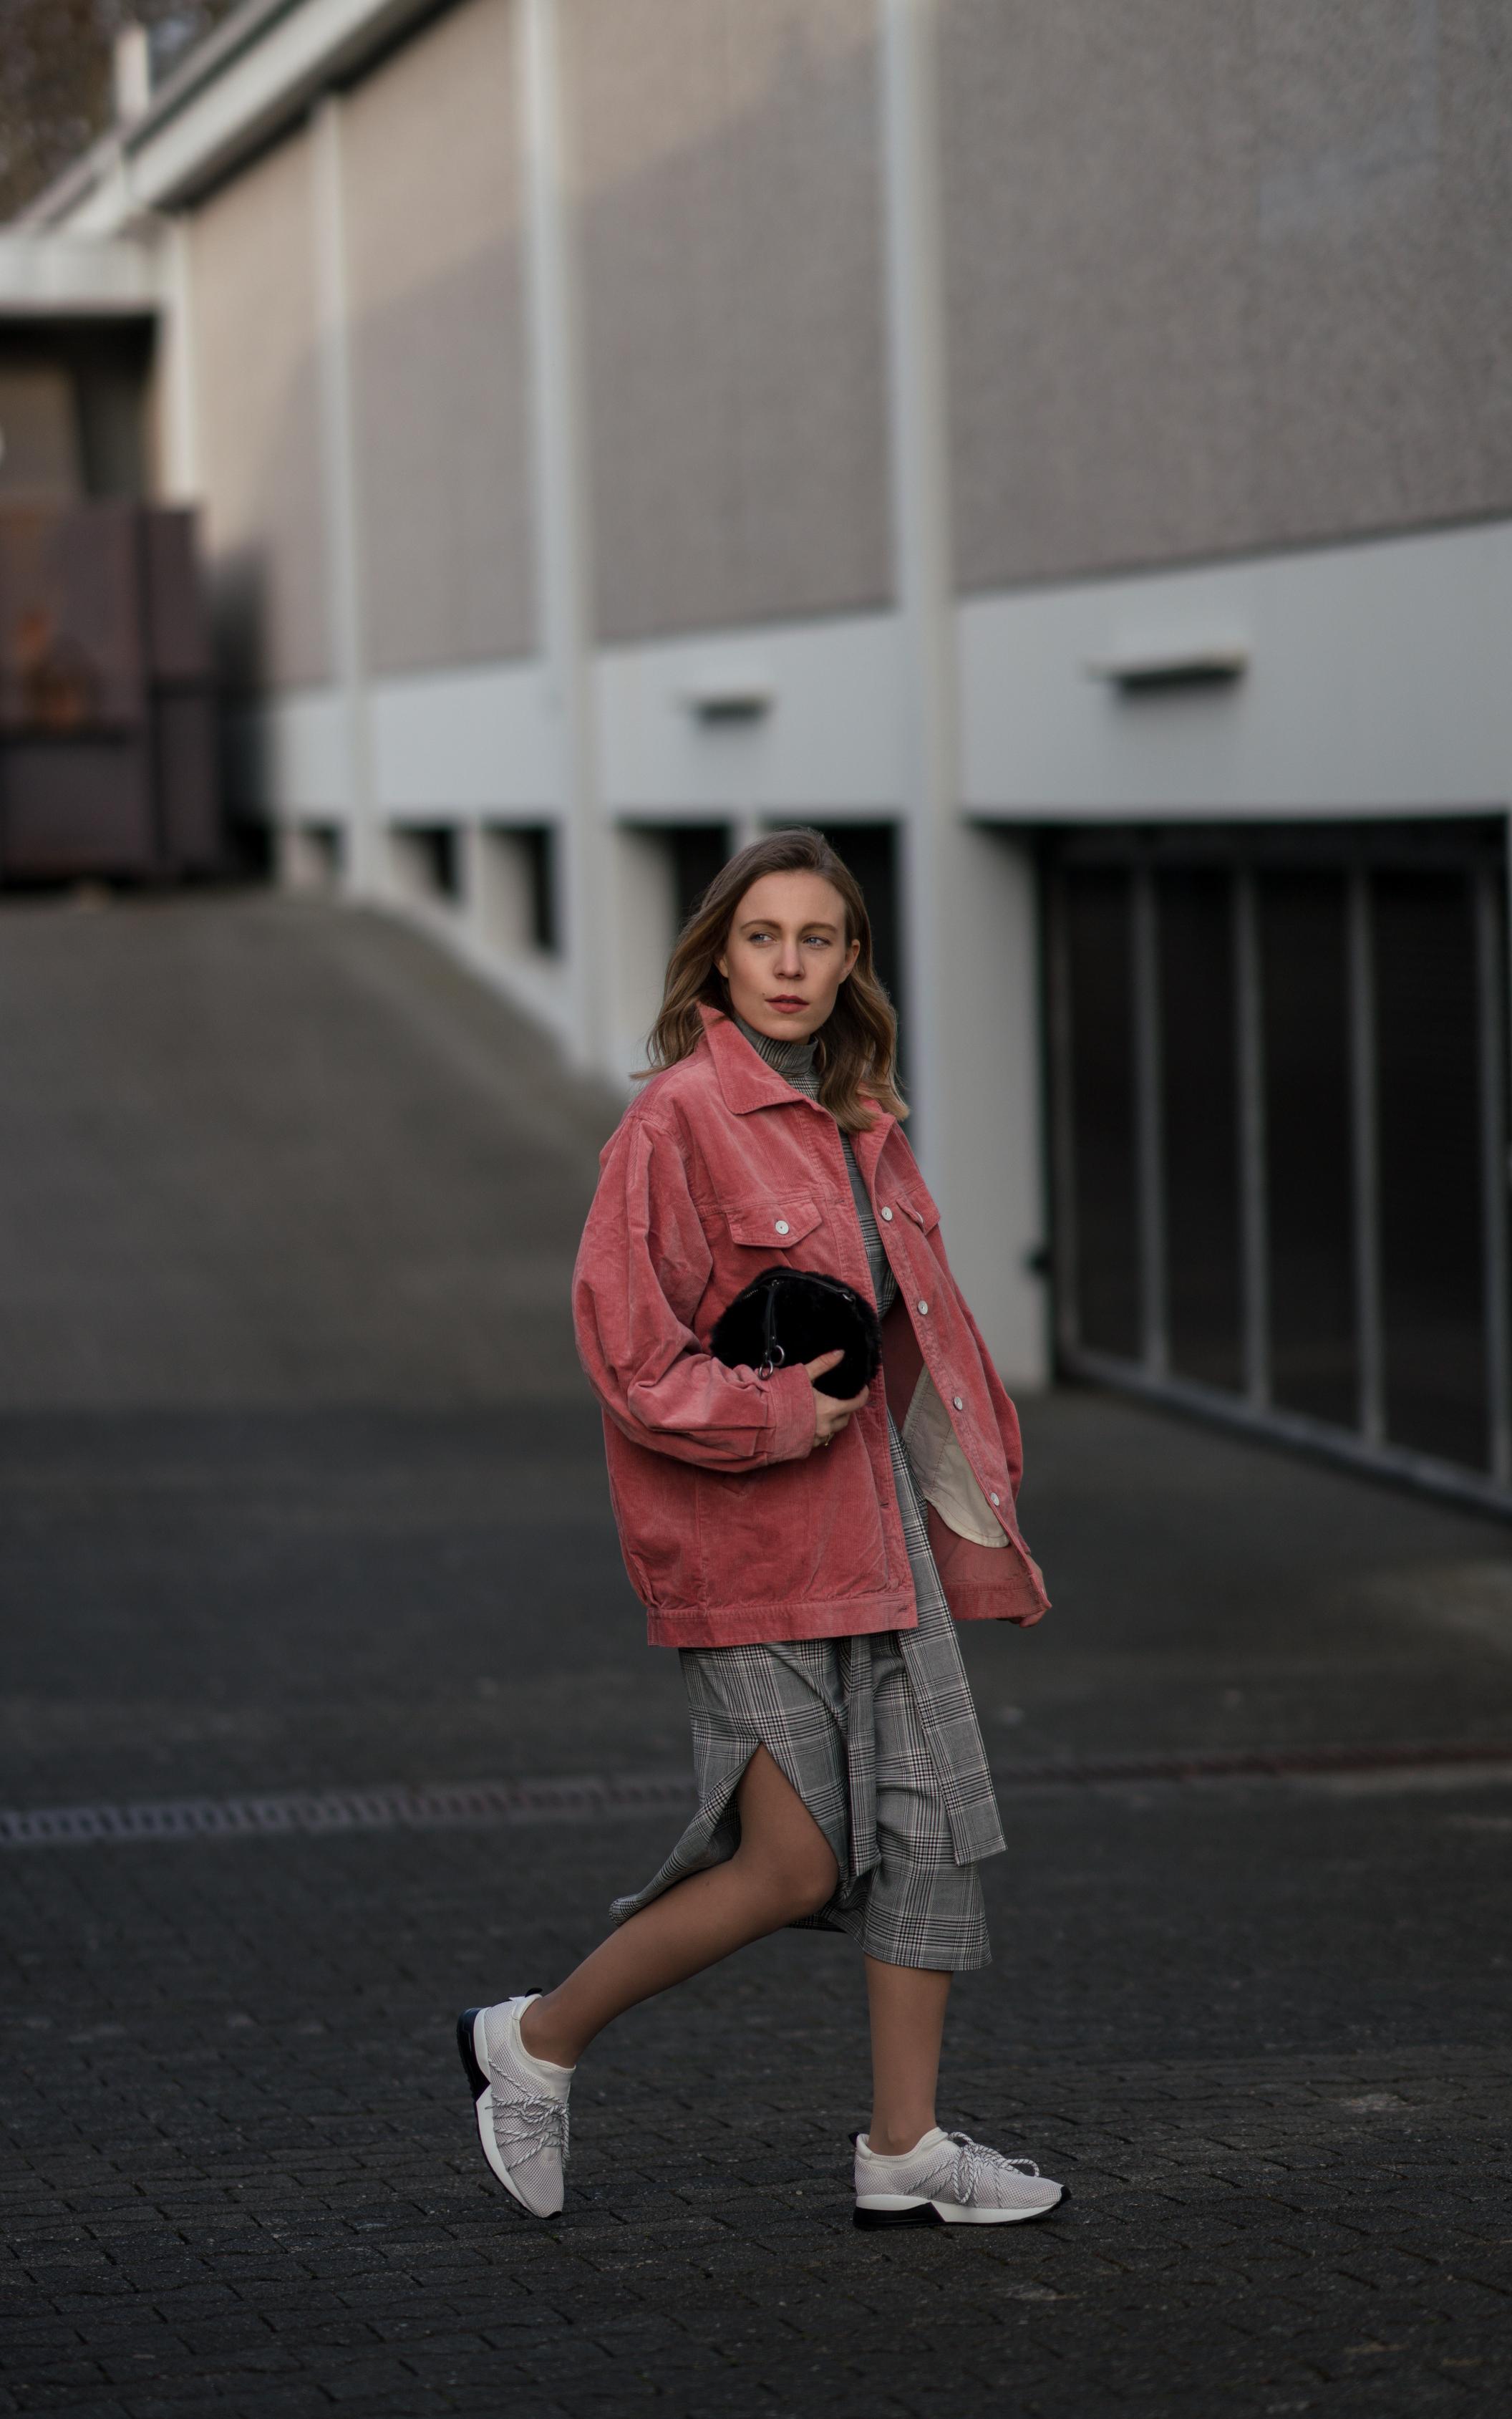 Pink Cord Jacket Glencheck Dress White Sneakers oversize Mango Cordjacke kariertes Kleid Zara Cord Trend Streetstyle Modeblog Sariety Fashionblogger Heidelberg_5